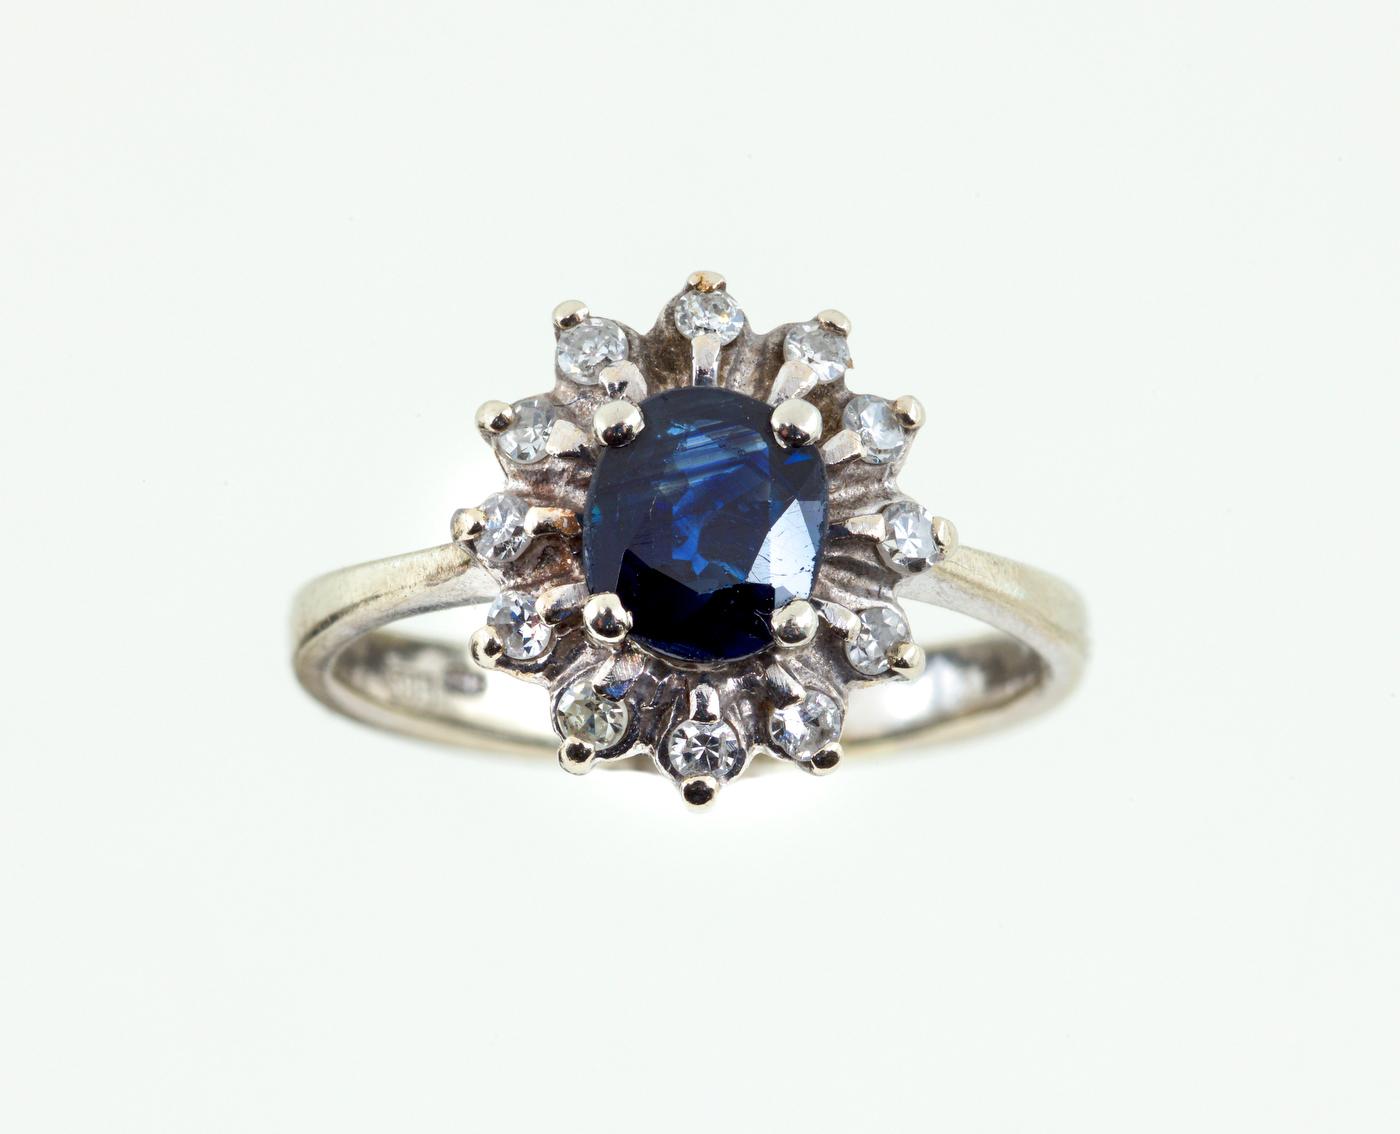 Diamond & Sapphire Ring | 14K White Gold